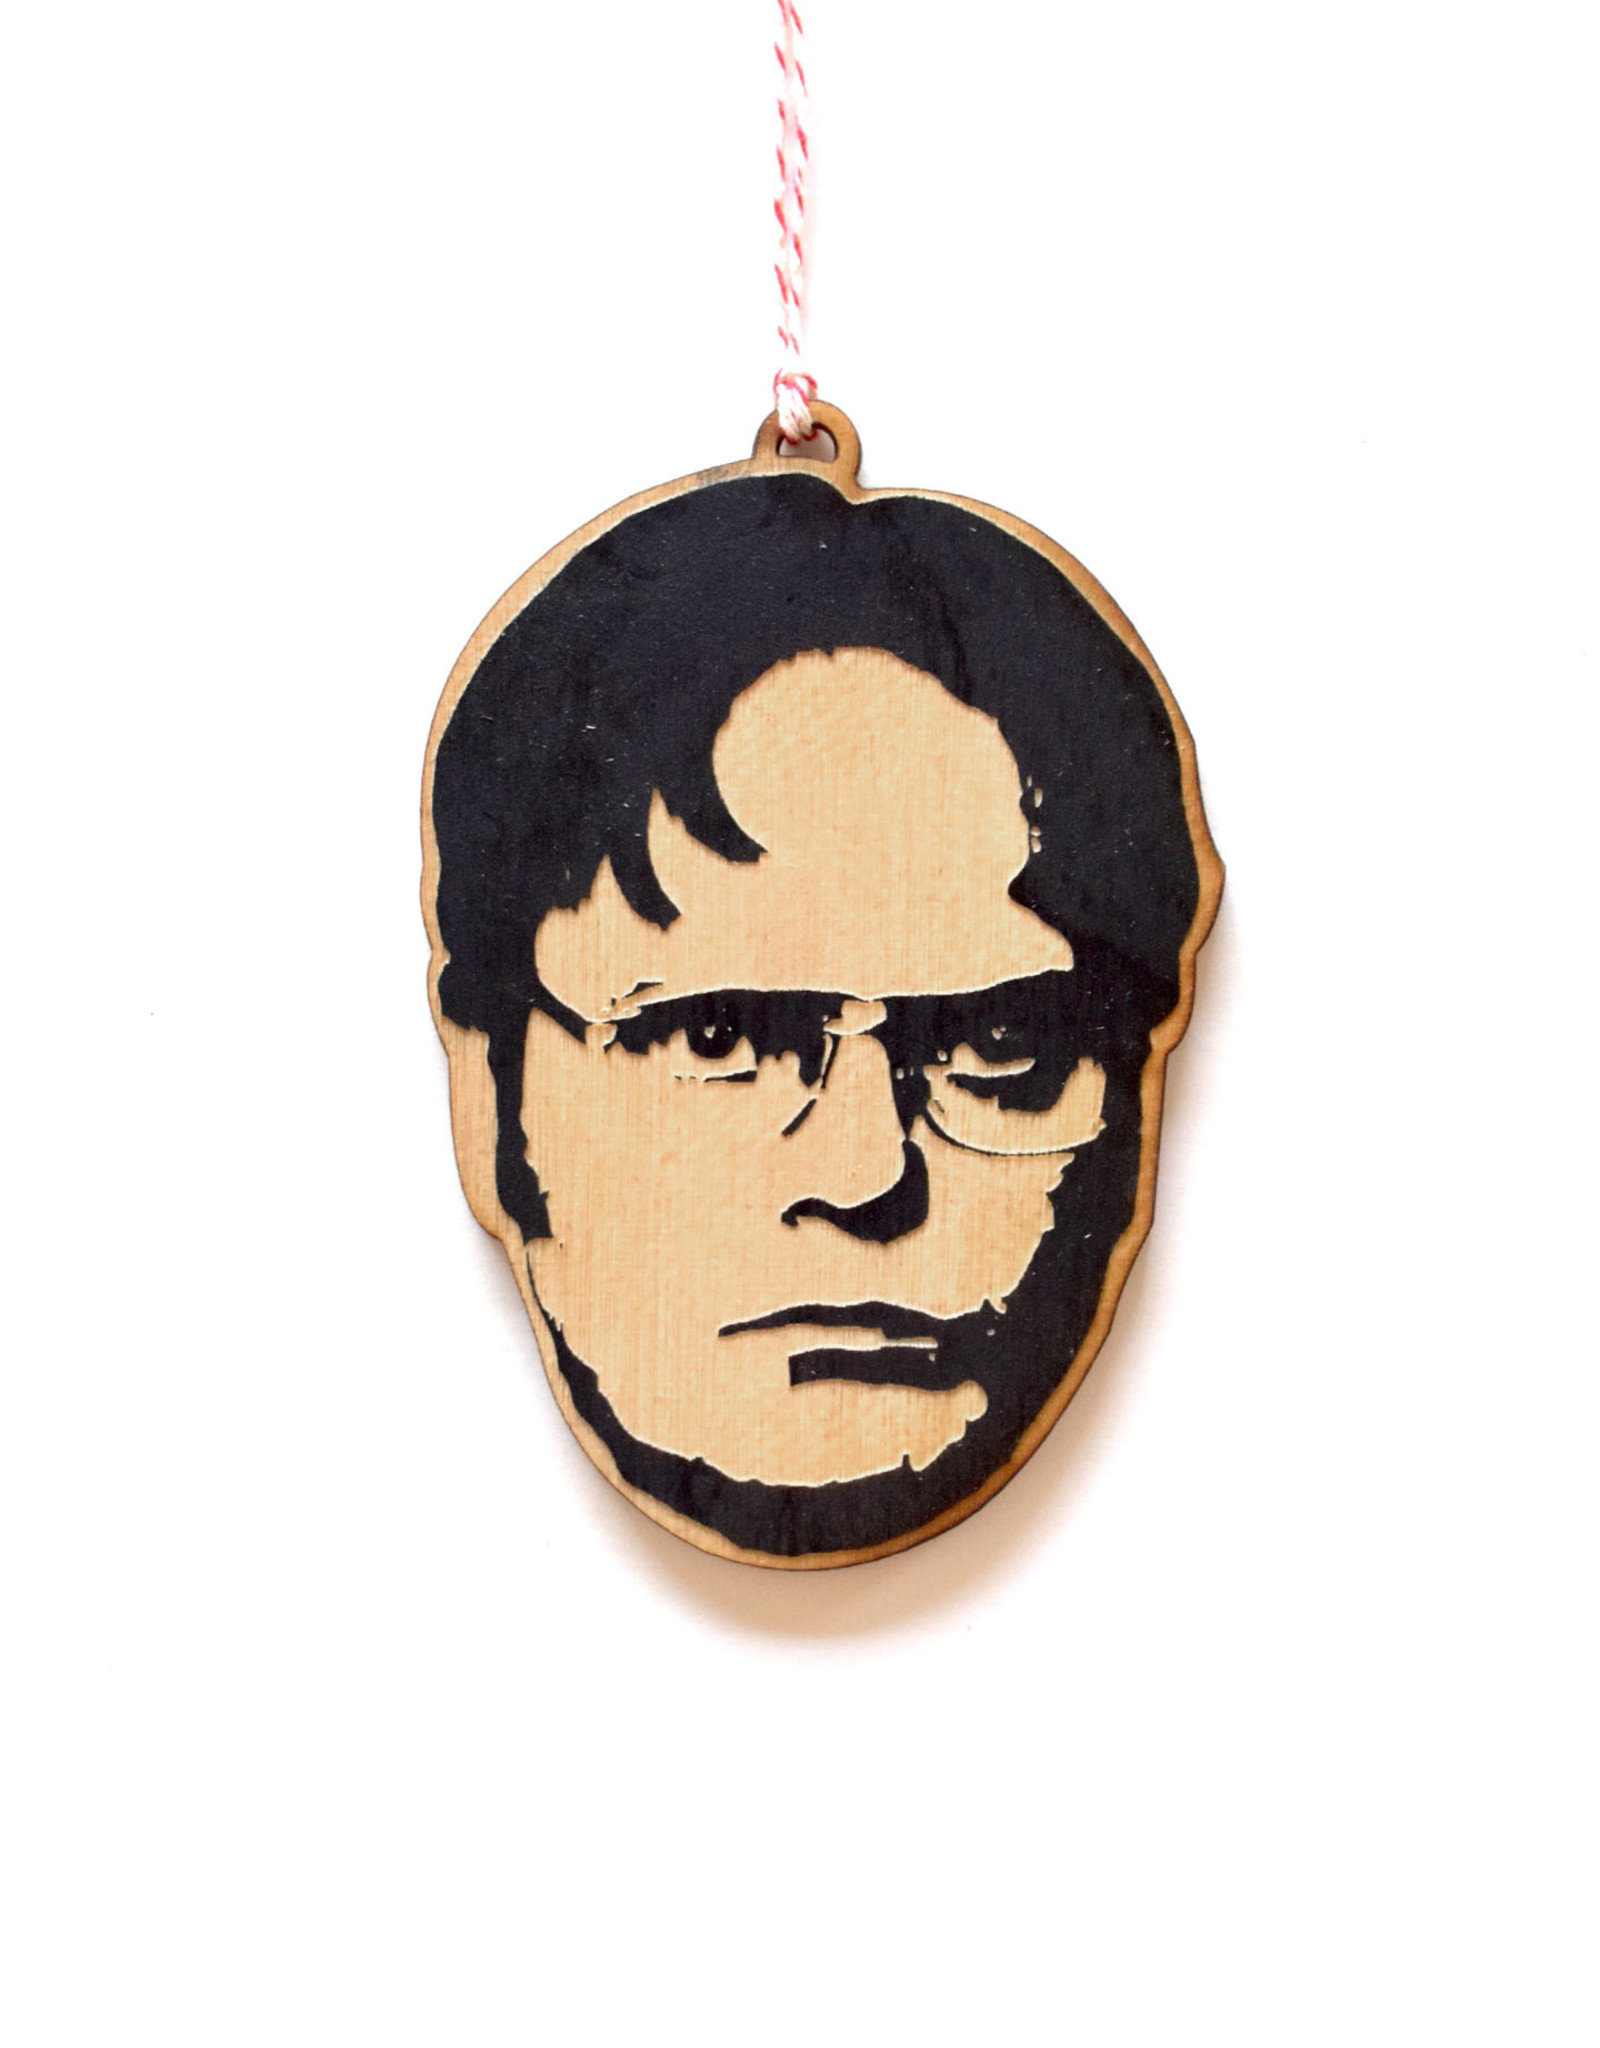 Dwight Schrute Wooden Ornament